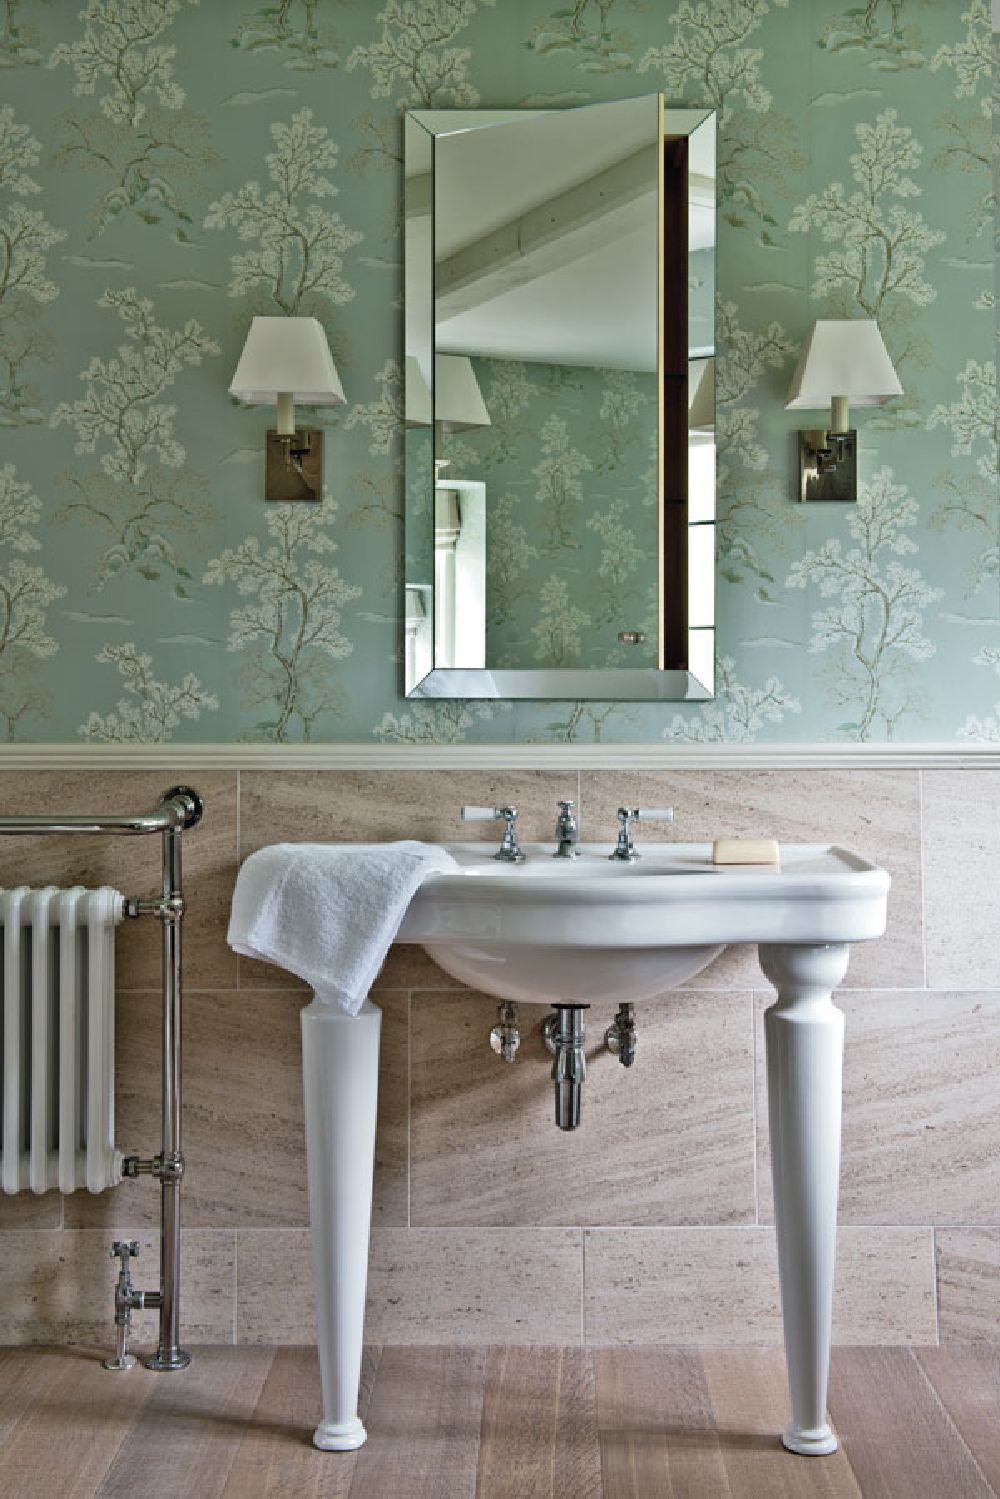 adelaparvu.com despre casa veche Anglia decorata in pasteluri, Design Interior Sims Hilditch Interior Design, Dorset Manor House, Foto Polly Eltes (14)